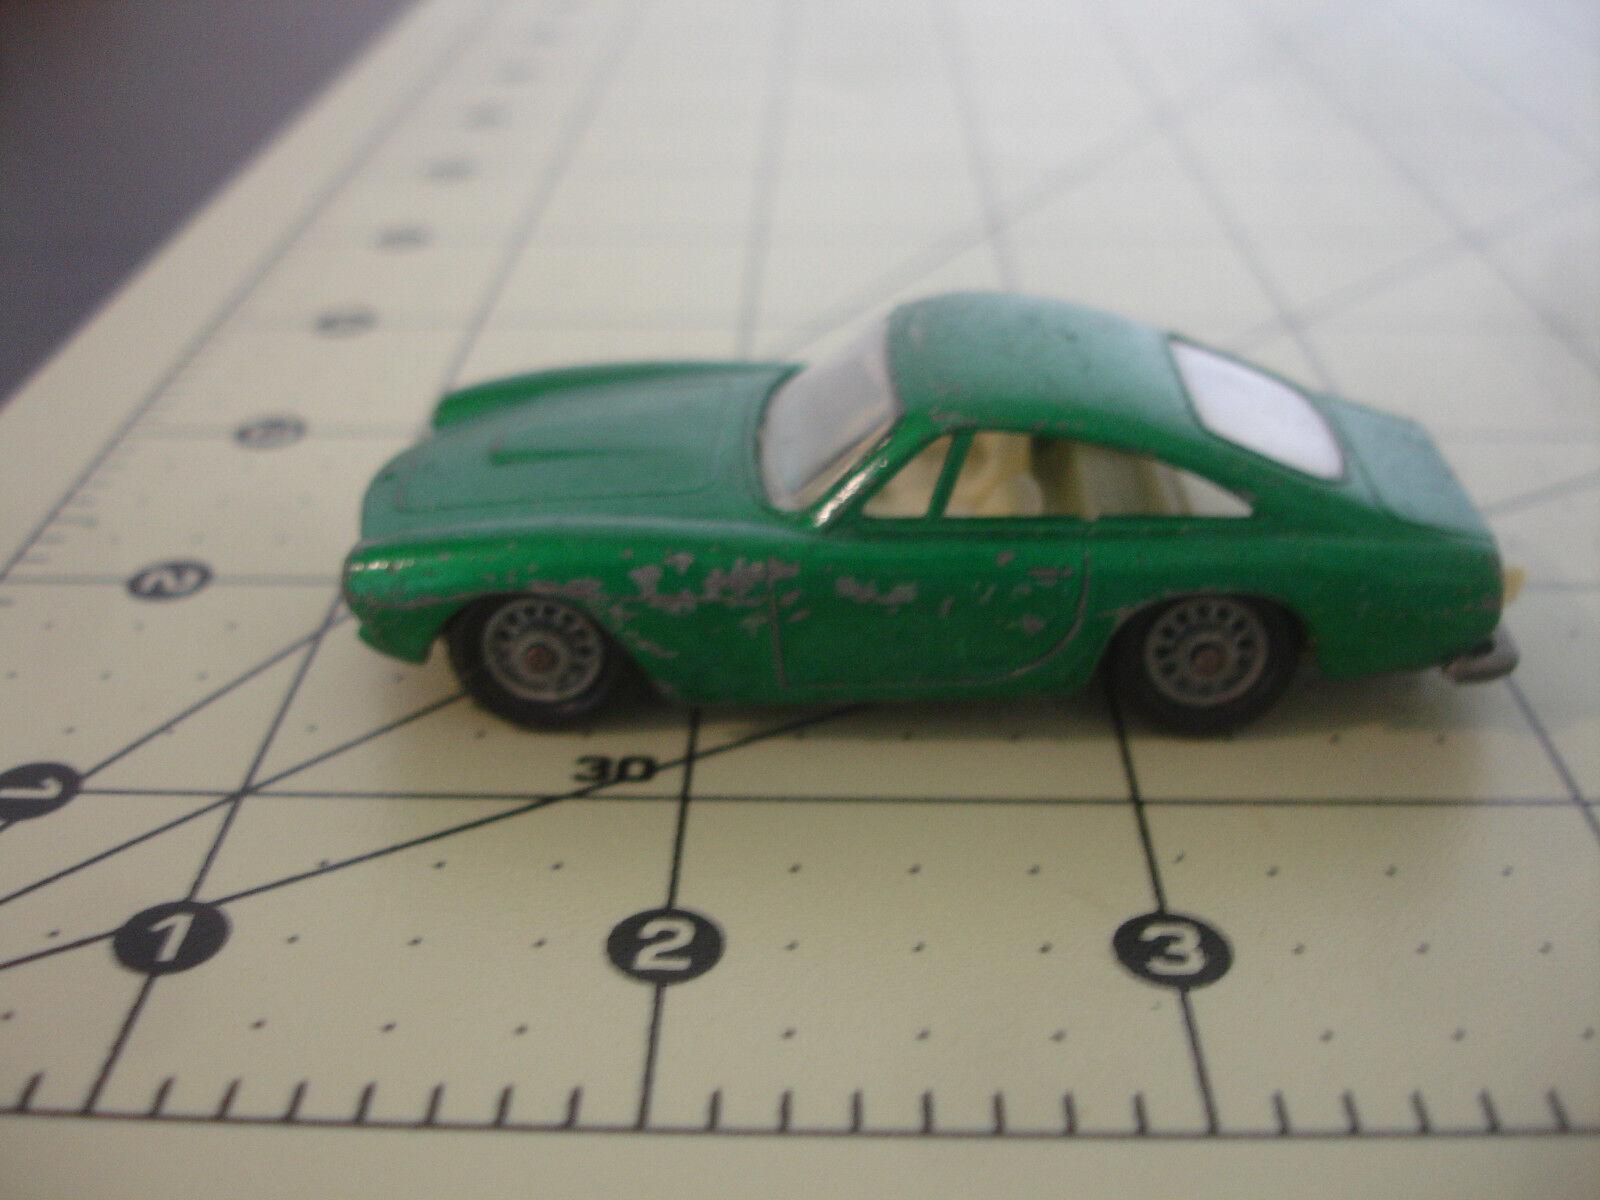 Old Vtg Diecast Matchbox Ferrari Berlinetta Toy Car Made In England